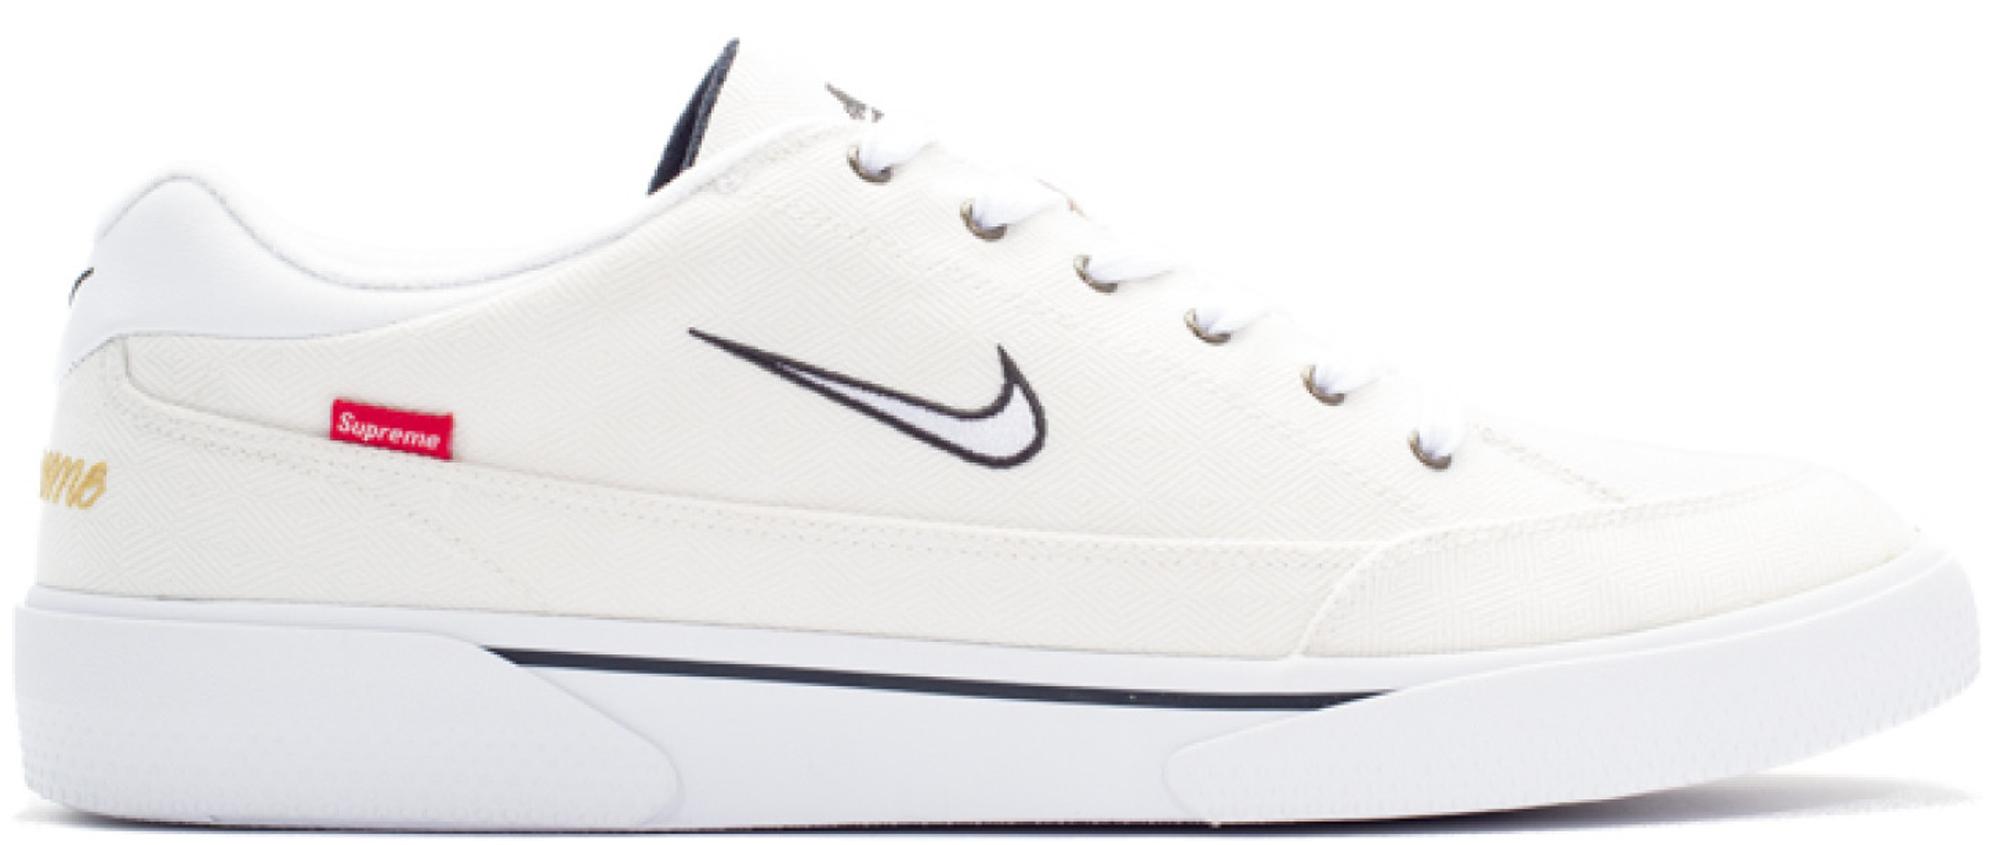 Nike SB GTS Supreme White - 801621-014